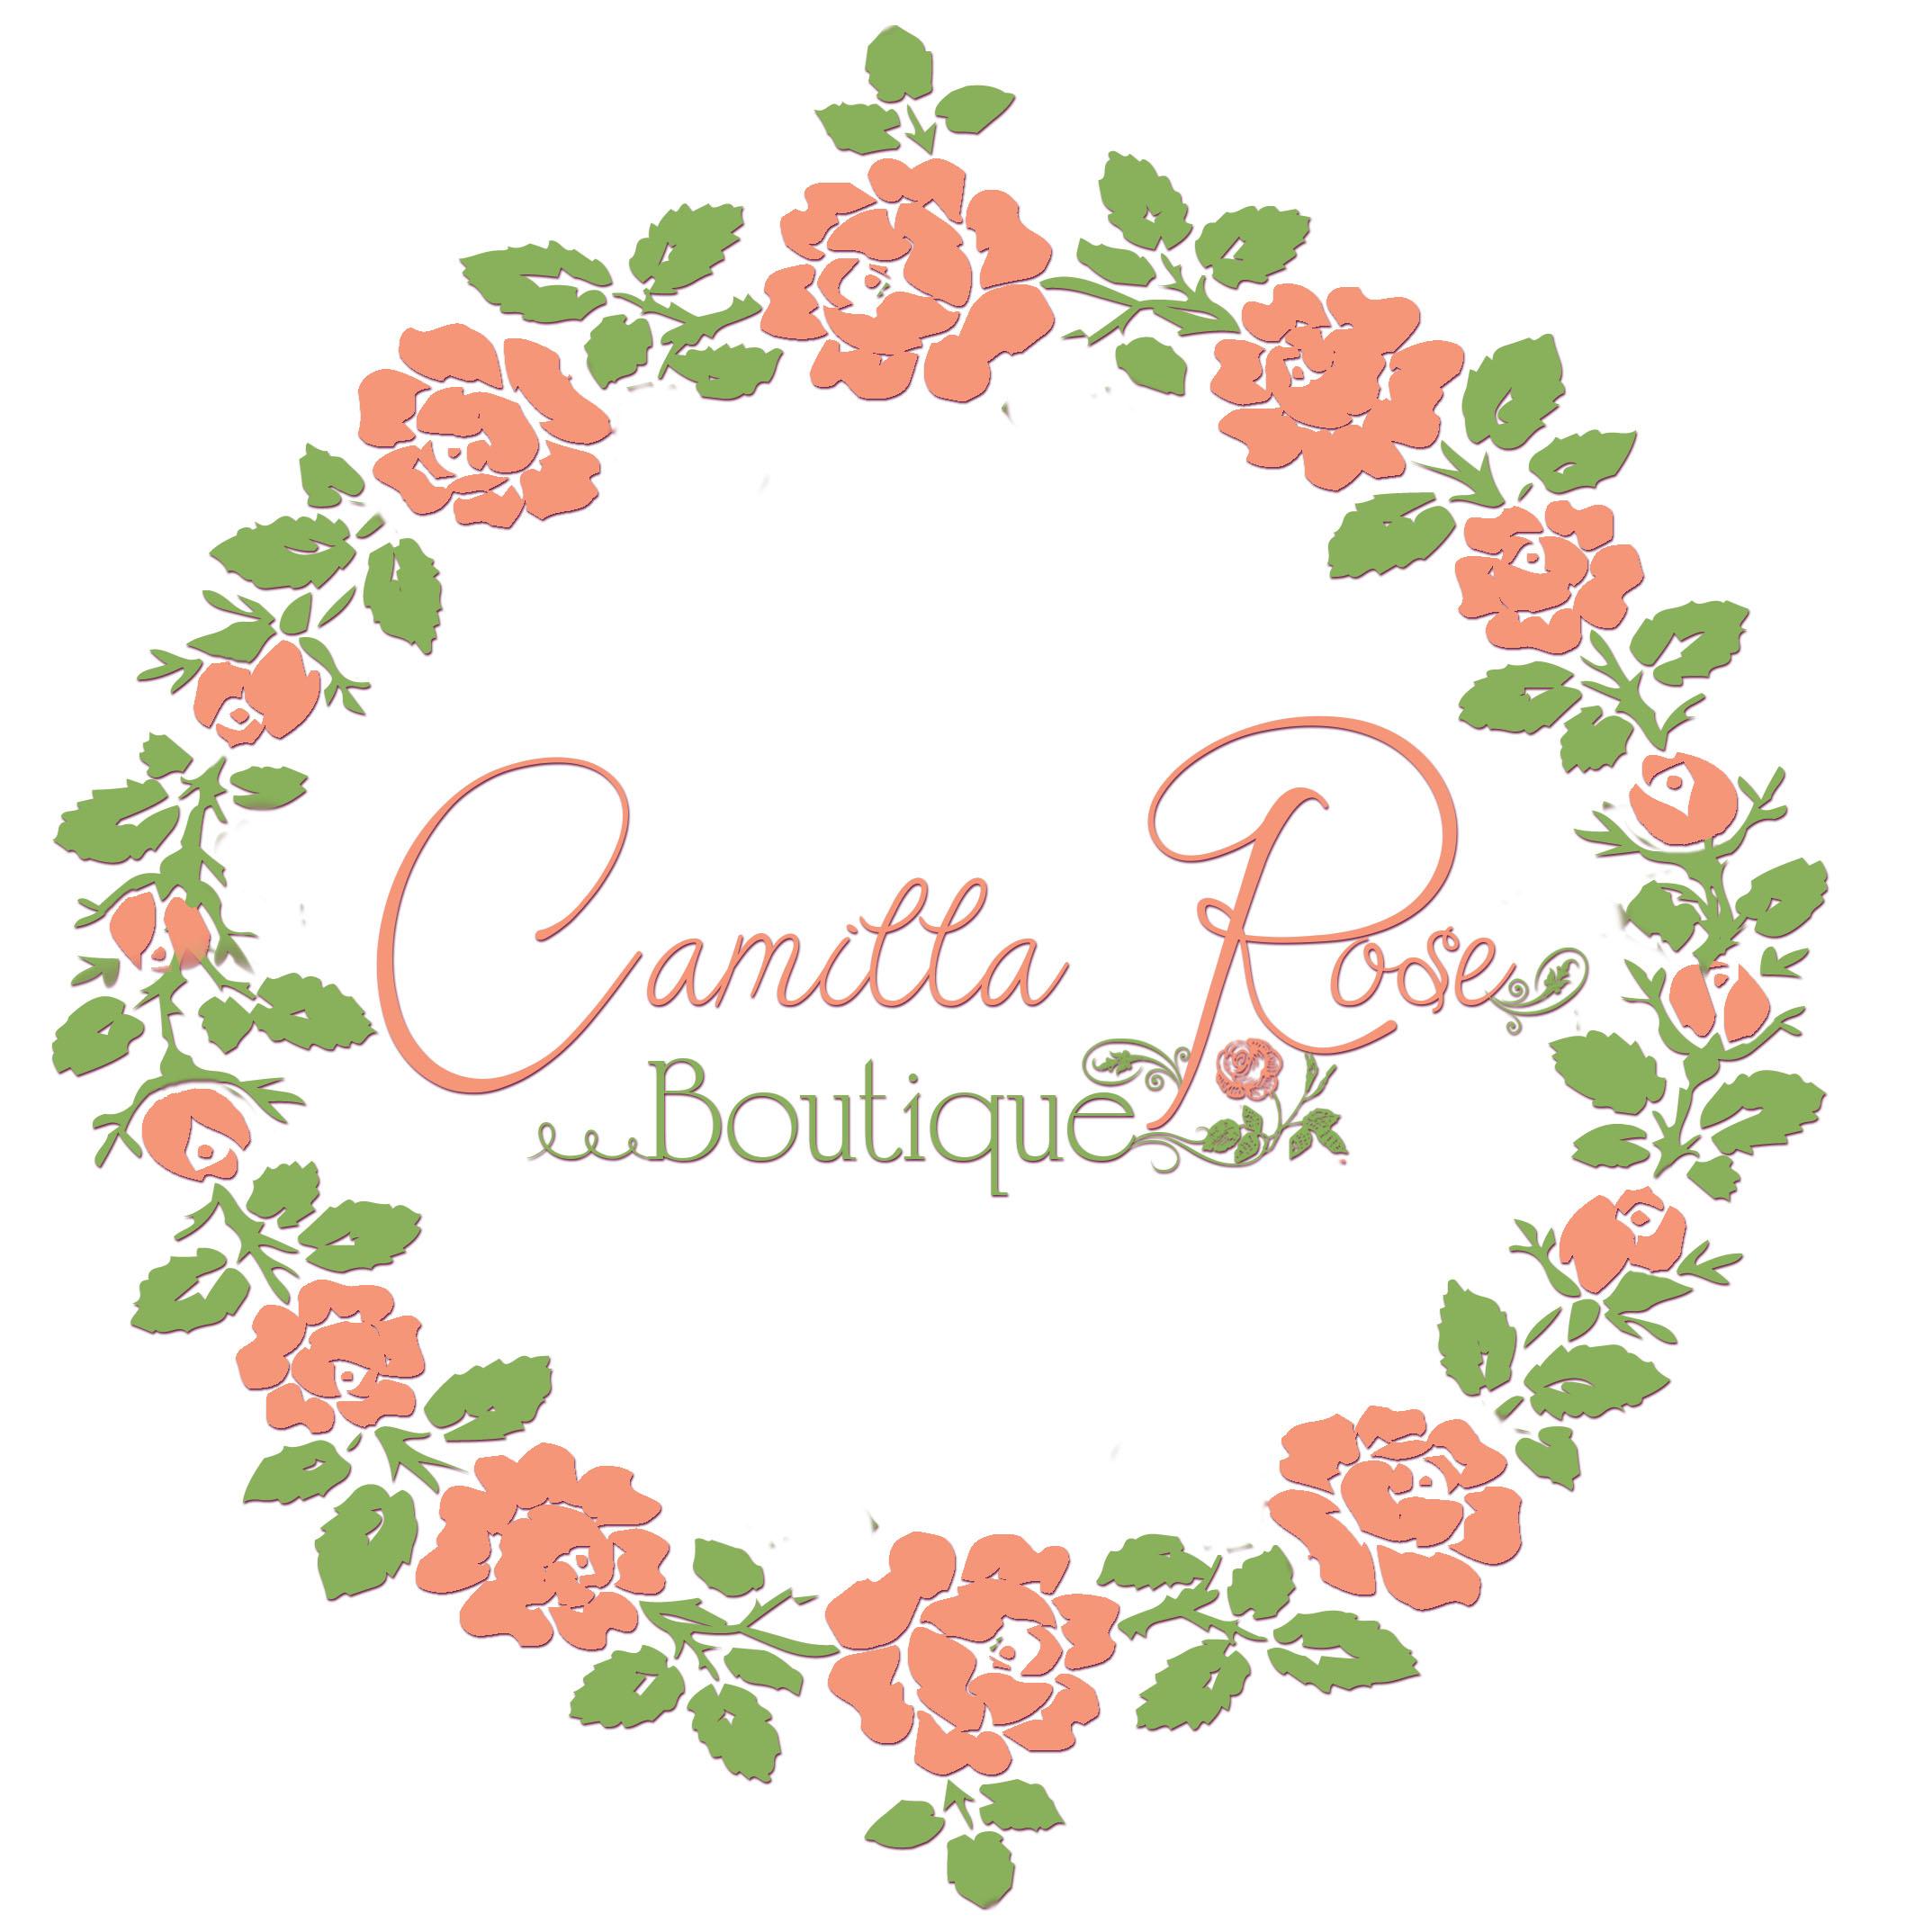 Camilla Rose Boutique framed.jpg